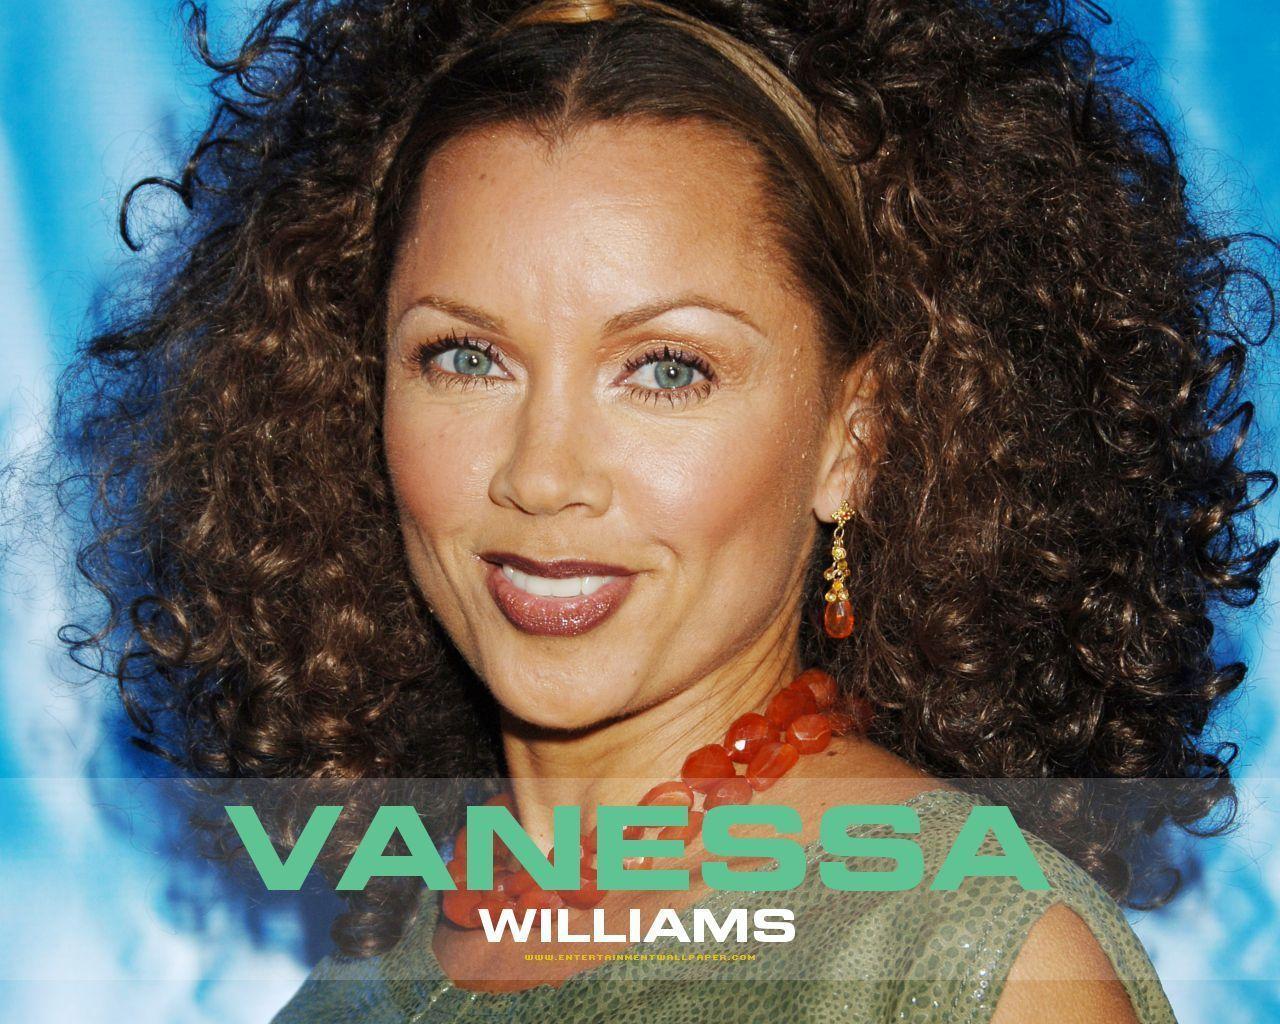 vanessa williams wallpaper | celebrities wallpaper | pinterest